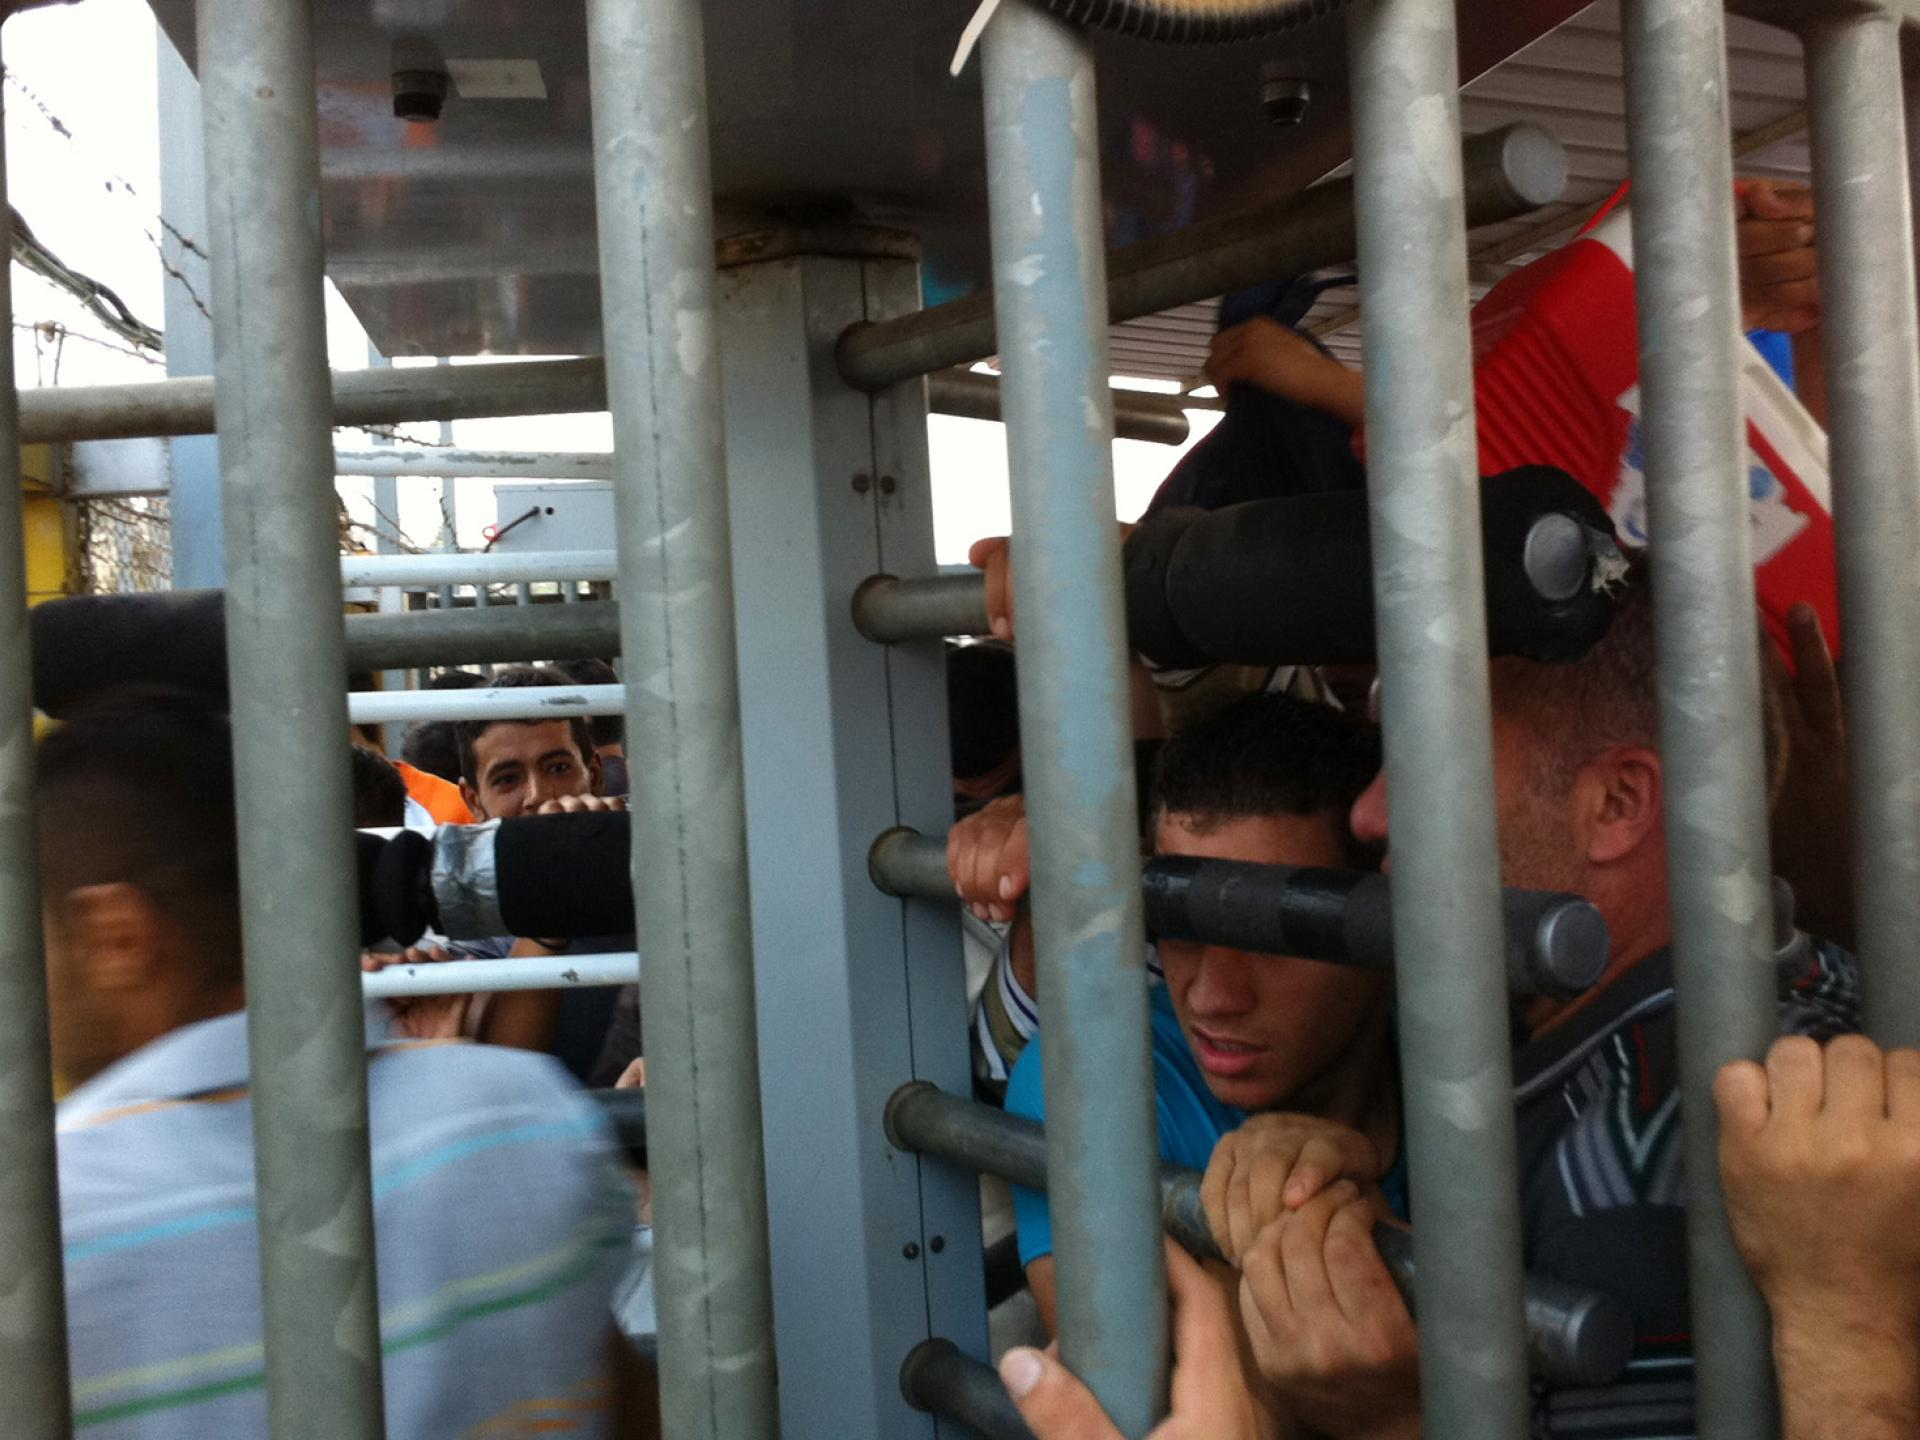 13.09.15 Barta'a/Reihan Checkpoint מחסום ברטעה-ריחן